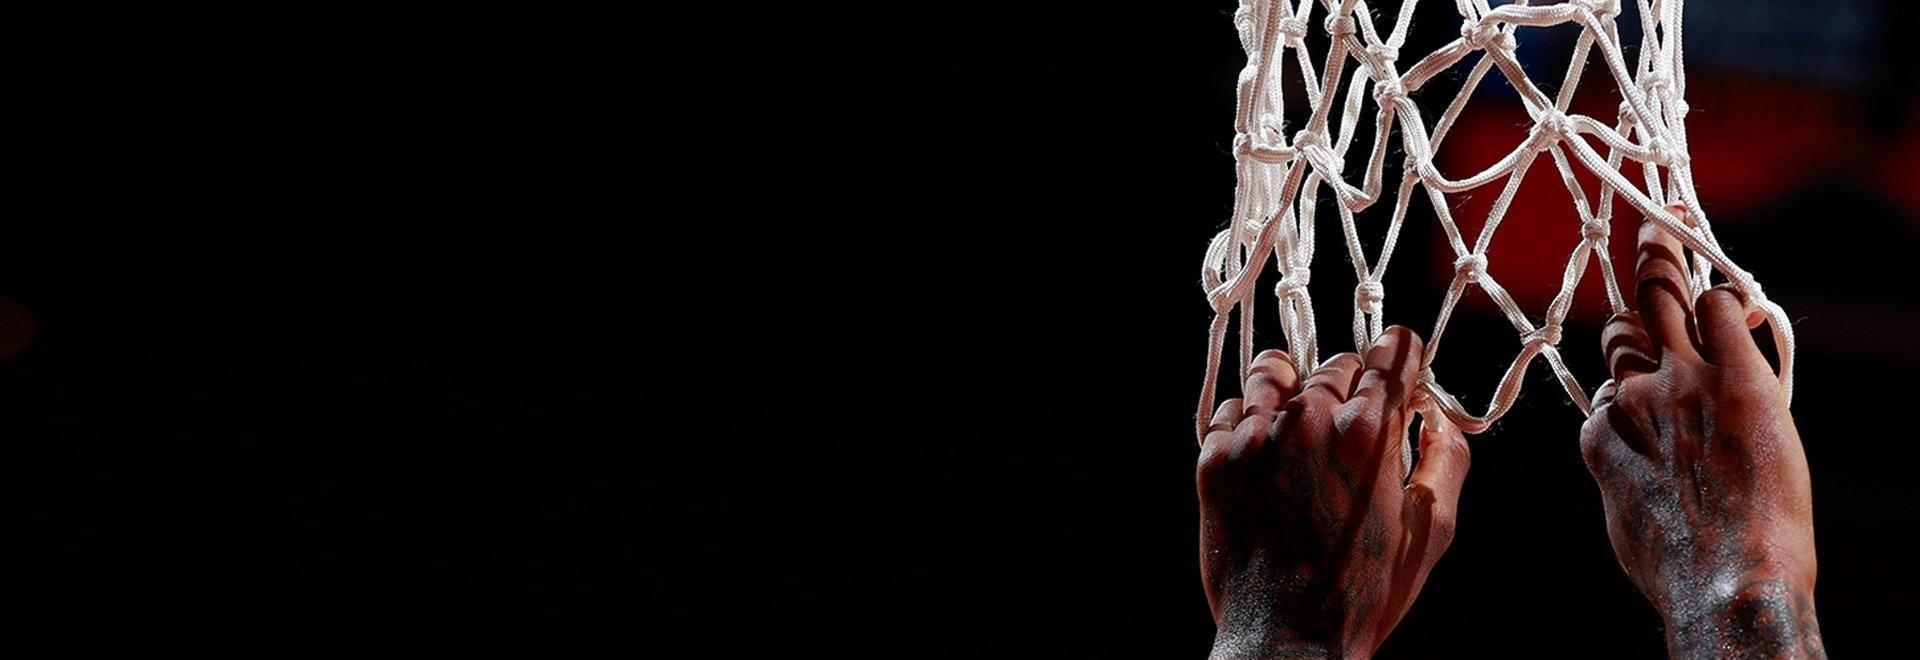 Spurs - Raptors 24/01/18